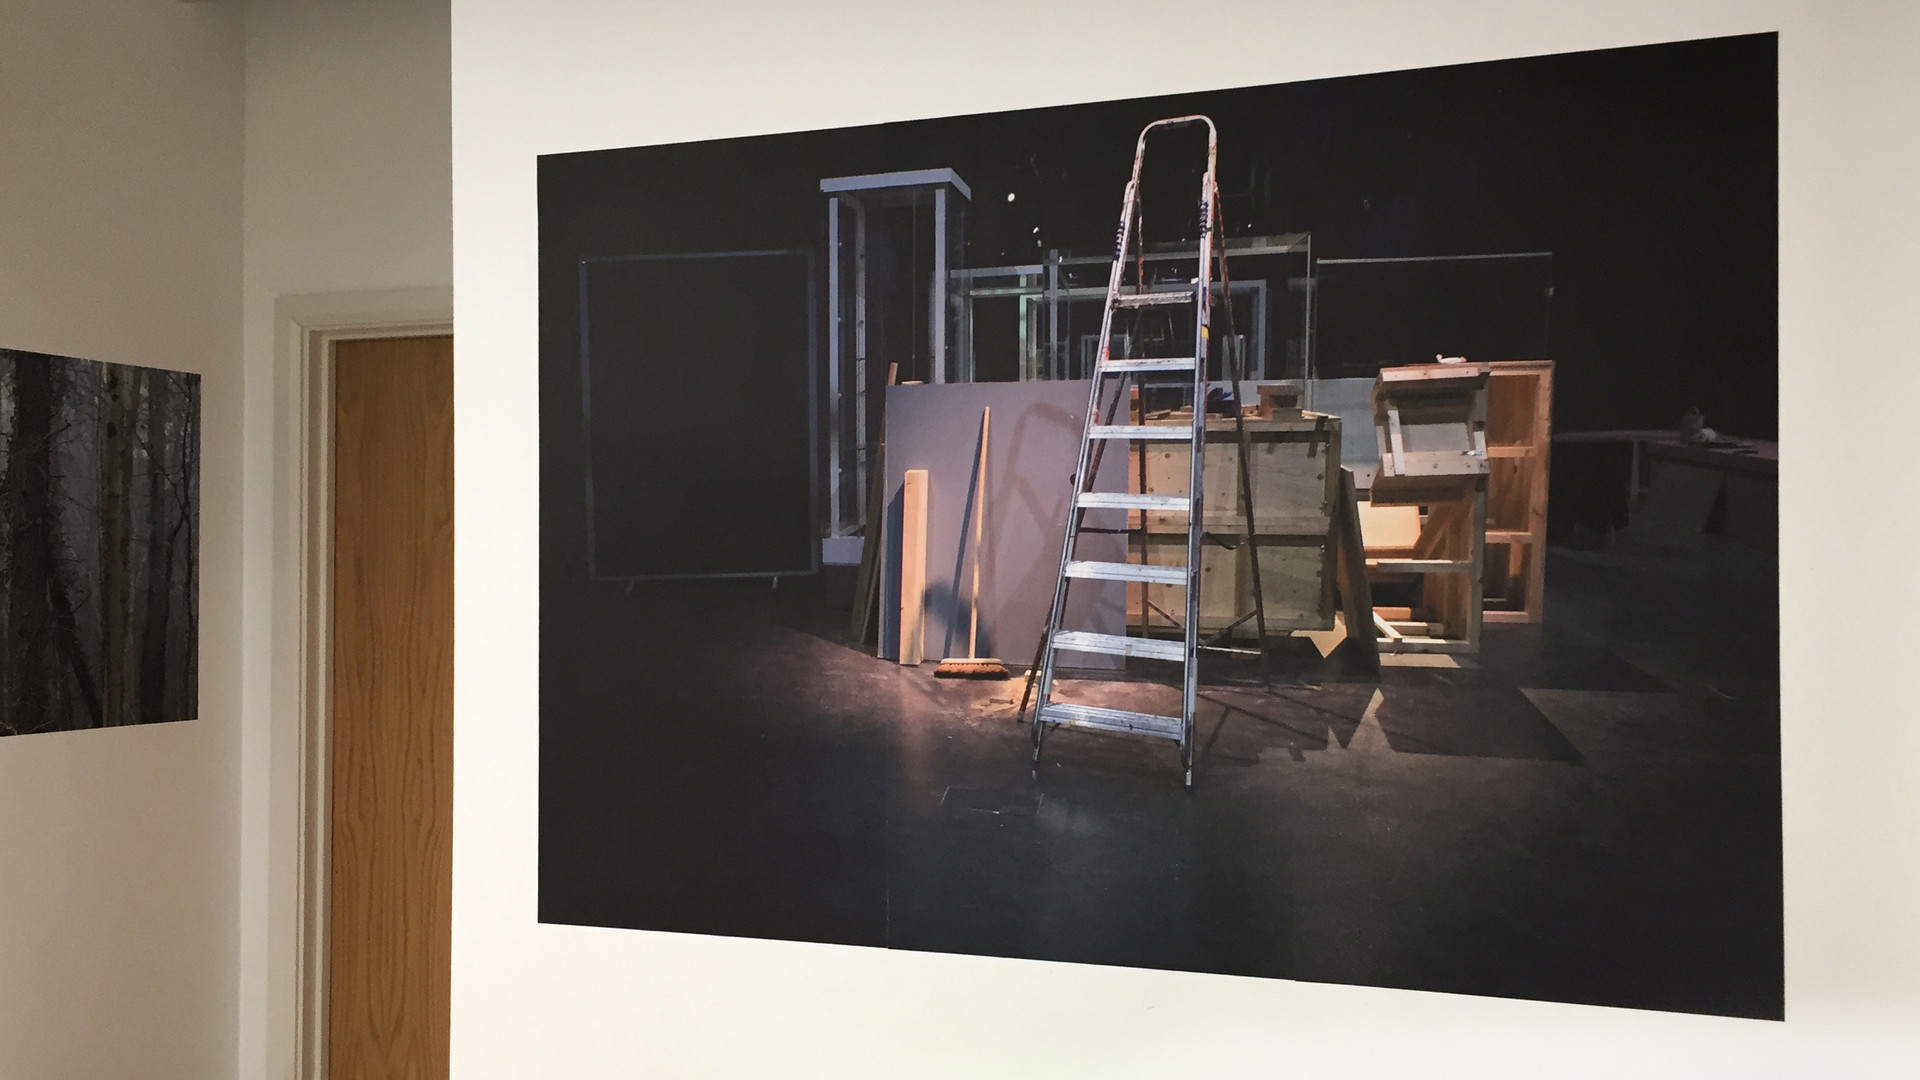 'Sonder' group exhibition at the Atrium. 2018-19